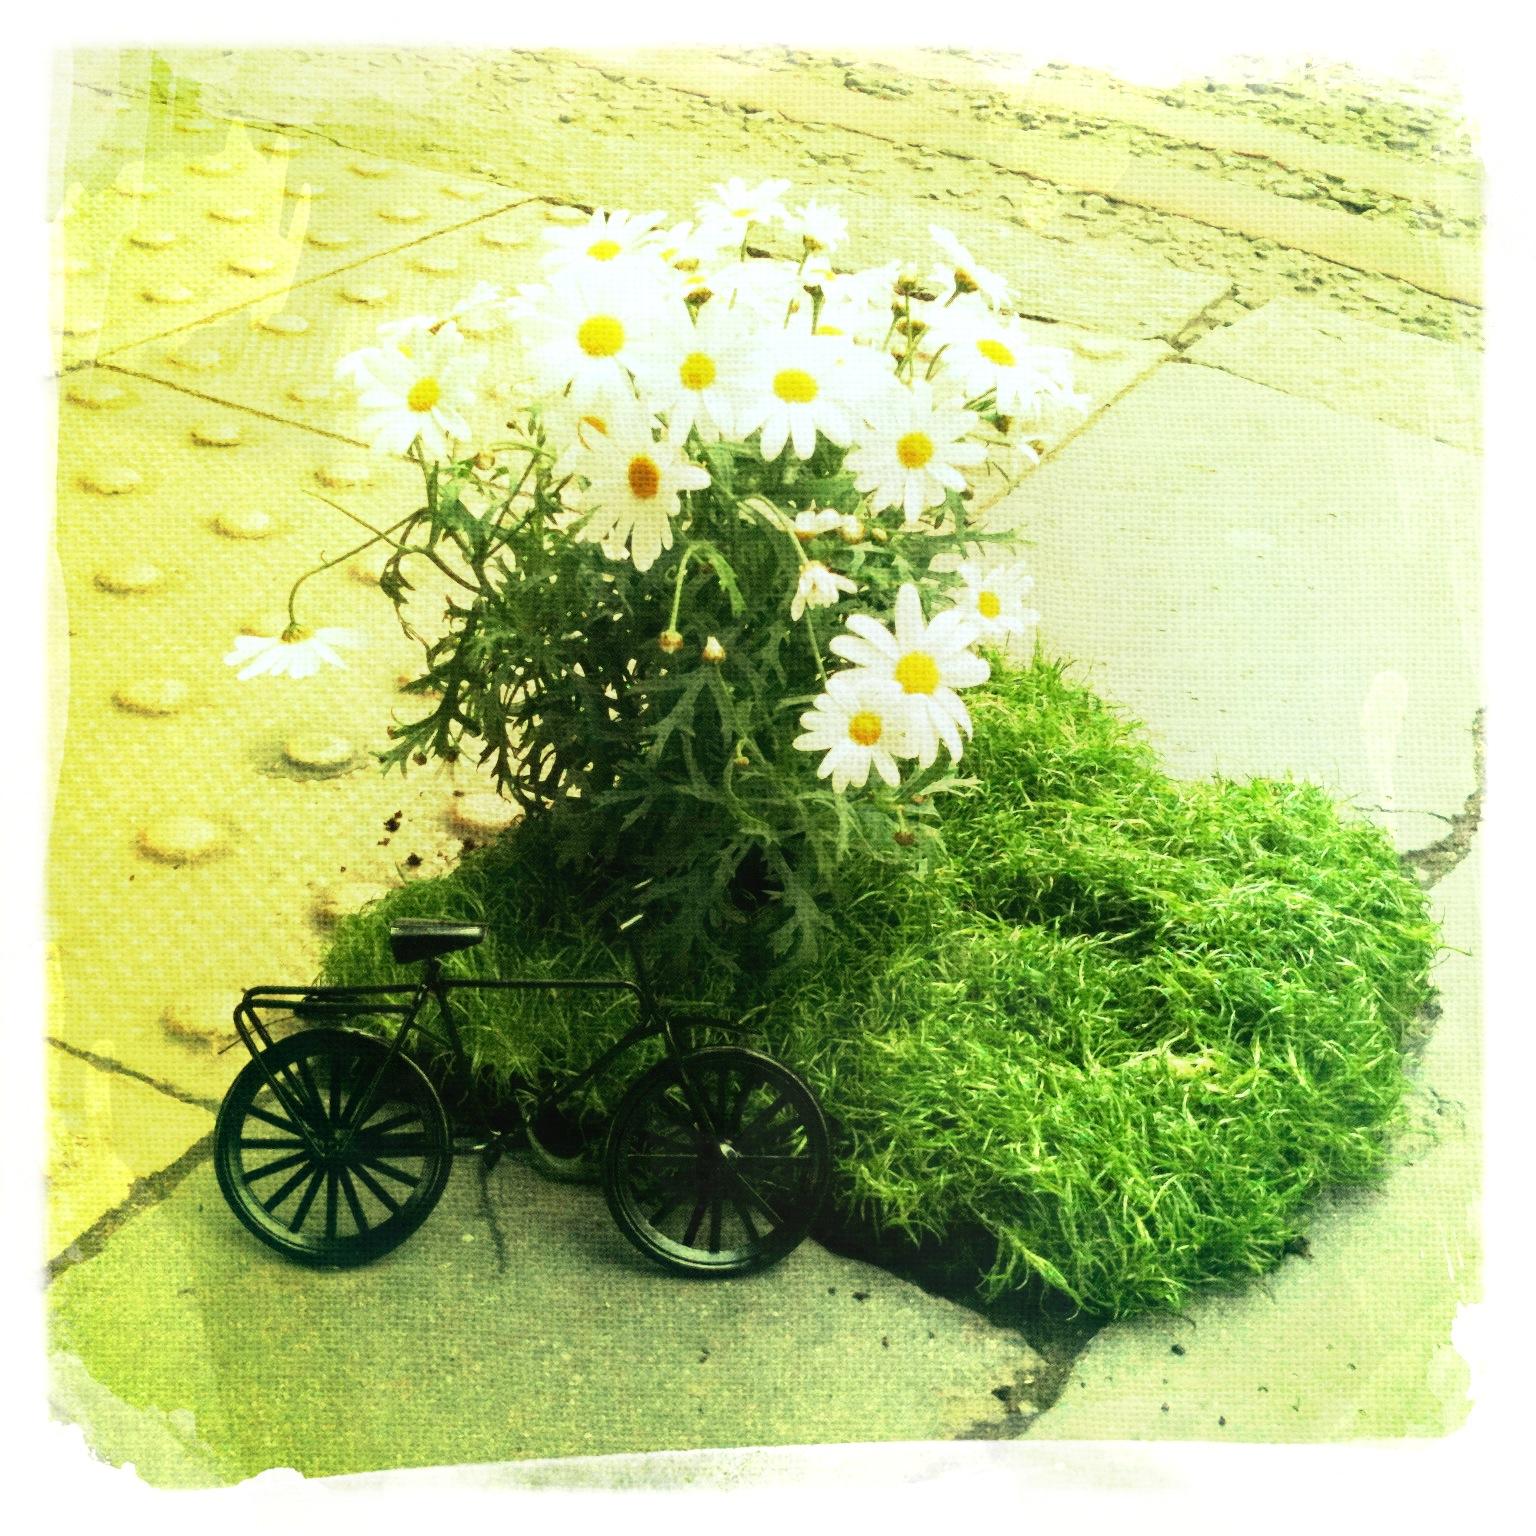 pothole garden bike south london mini garden road